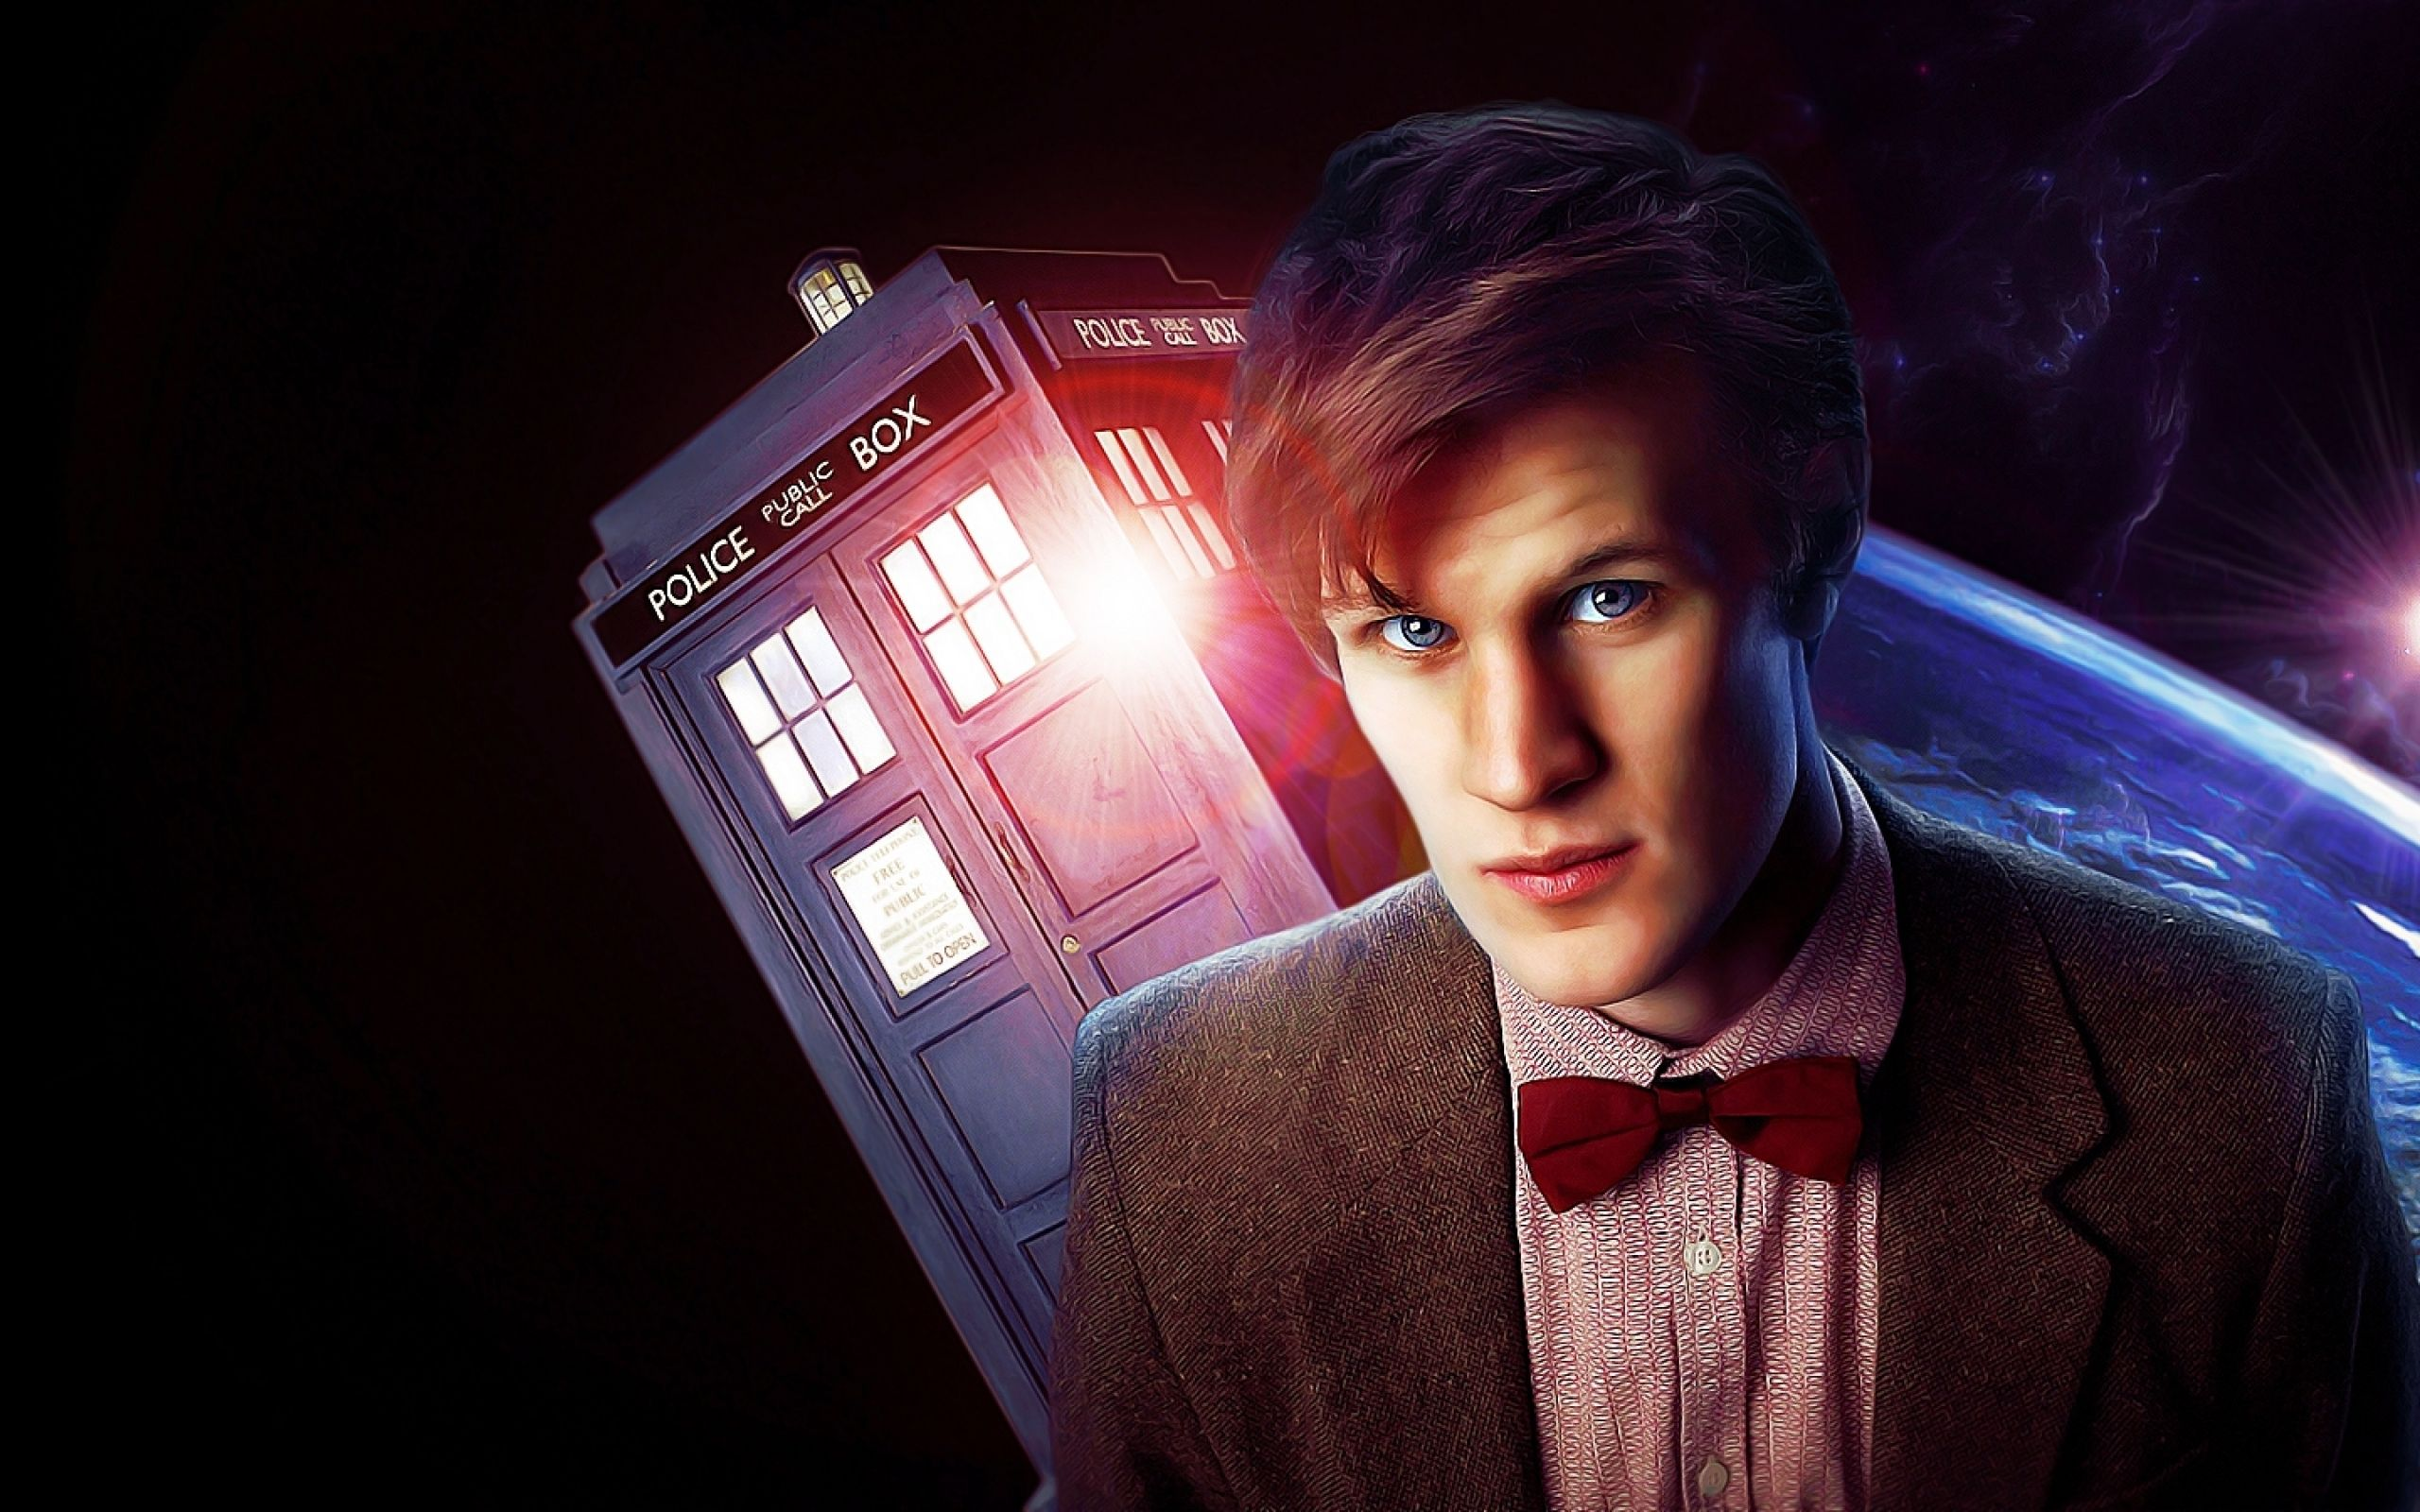 Tardis Matt Smith Eleventh Doctor Doctor Who 1600x900 Wallpaper Art Hd Wallpaper Doctor Who Wallpaper Doctor Who Matt Smith